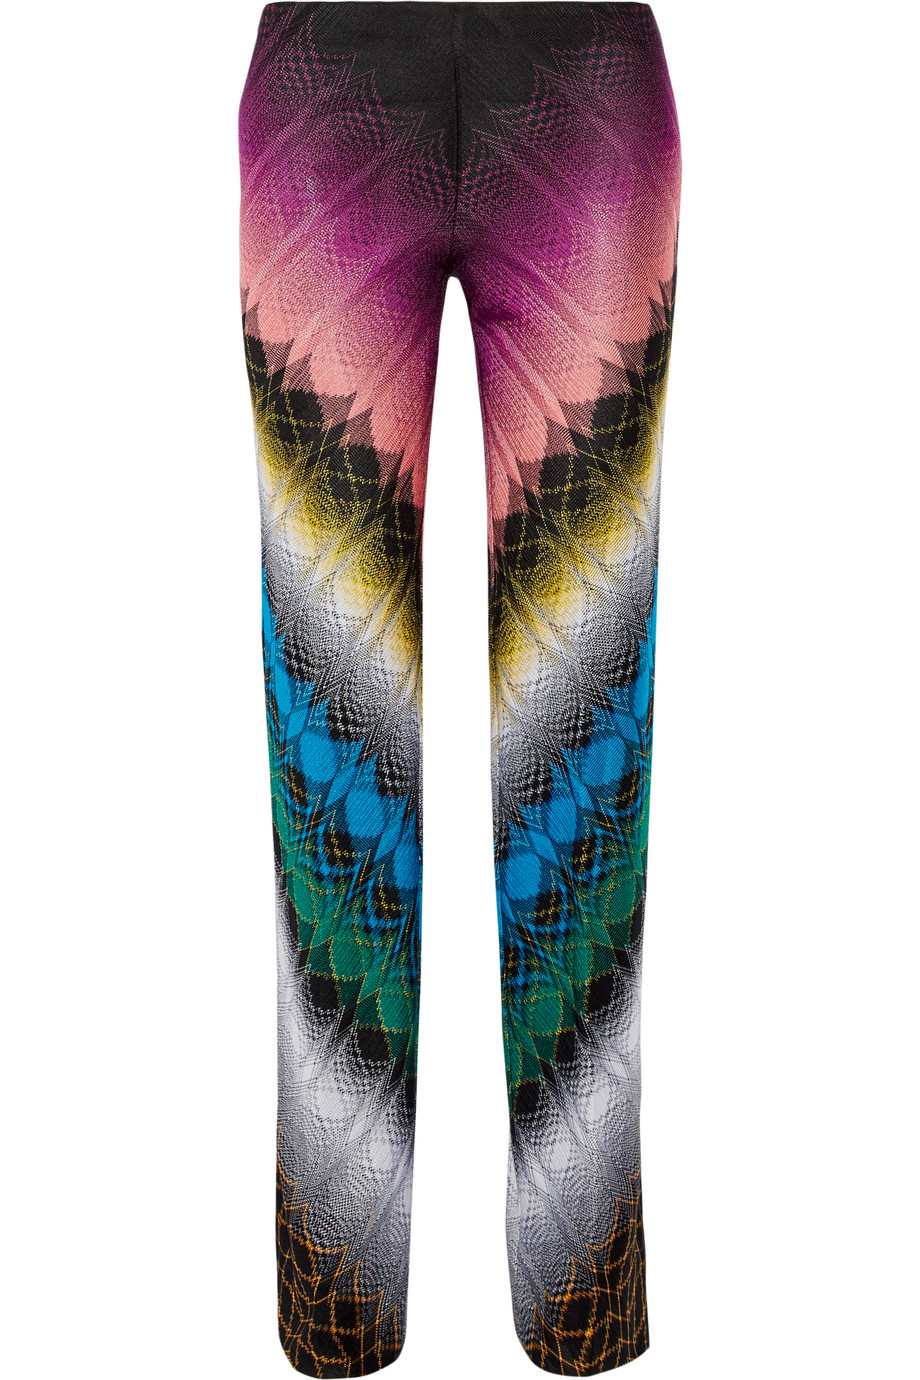 Missoni Crochet-Knit Straight-Leg Pants, Black, Women's, Size: 48